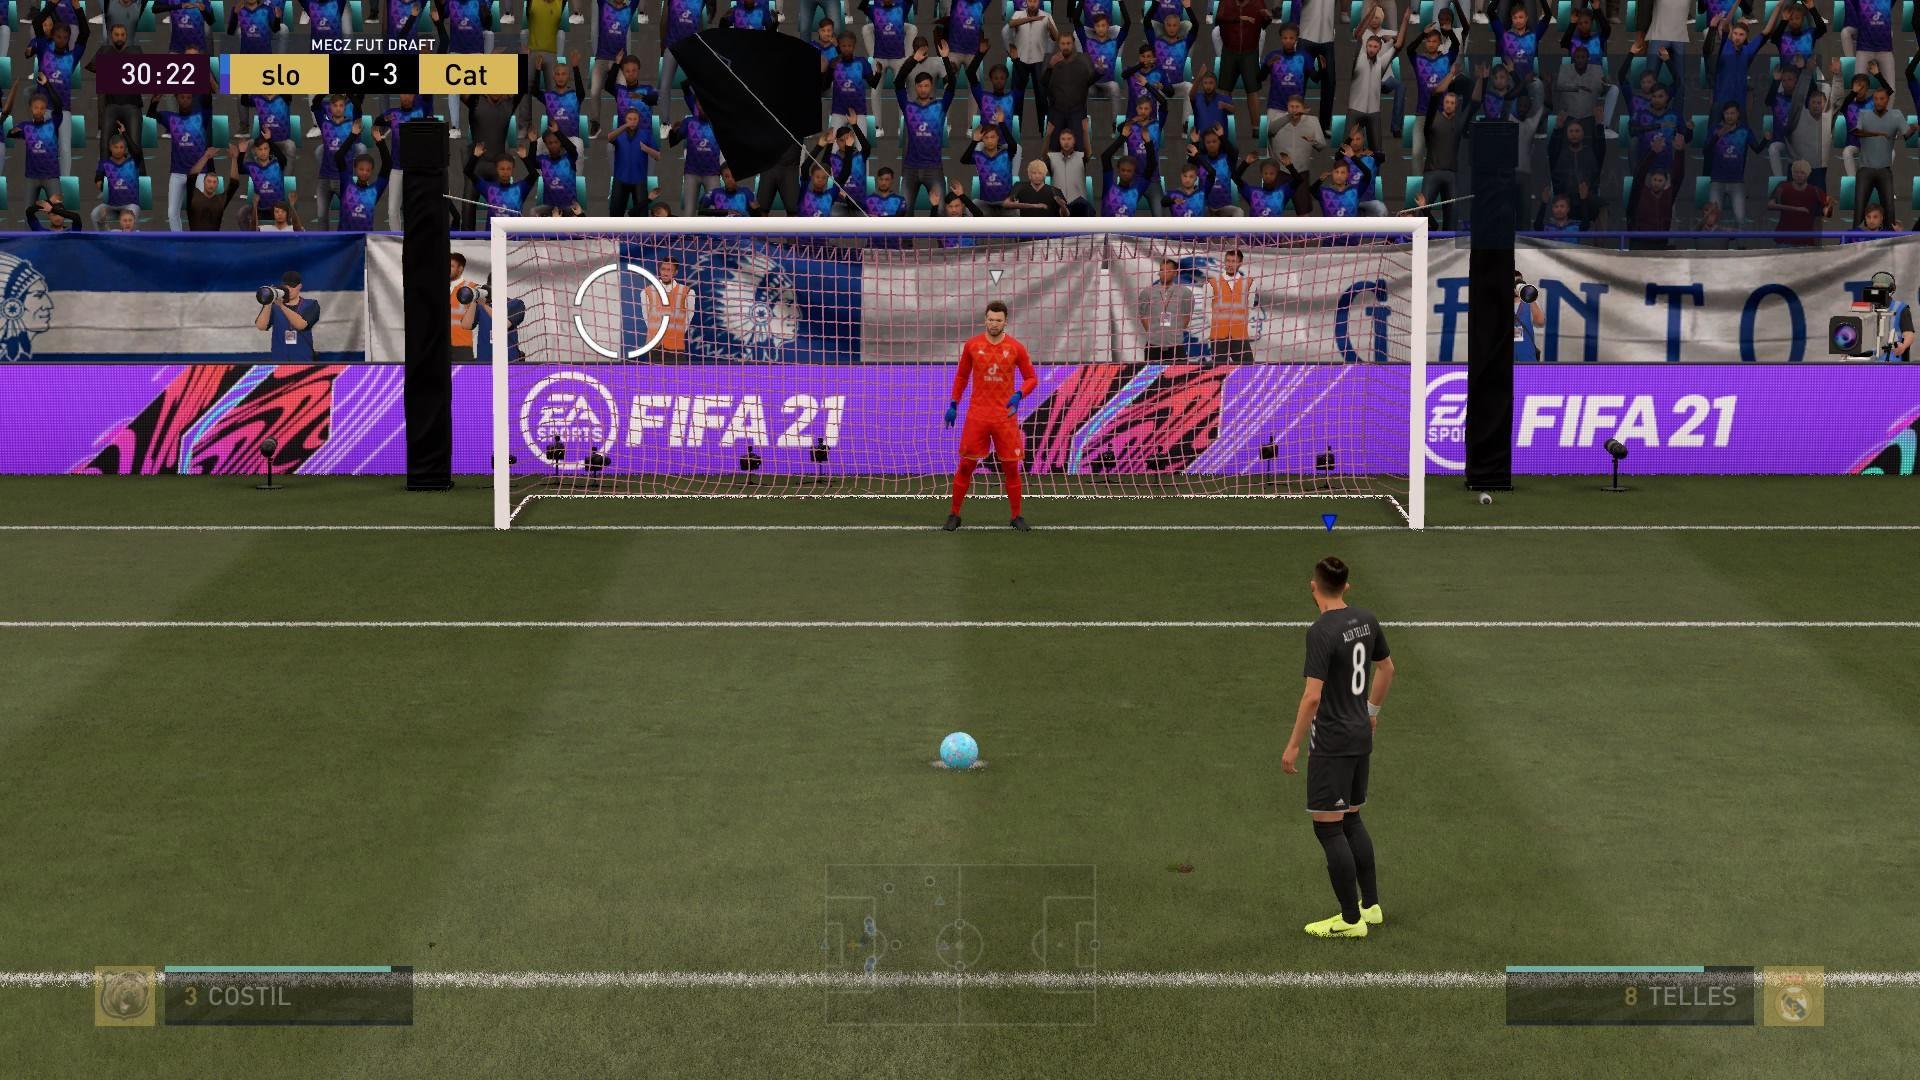 FIFA_21_recenzja_28_